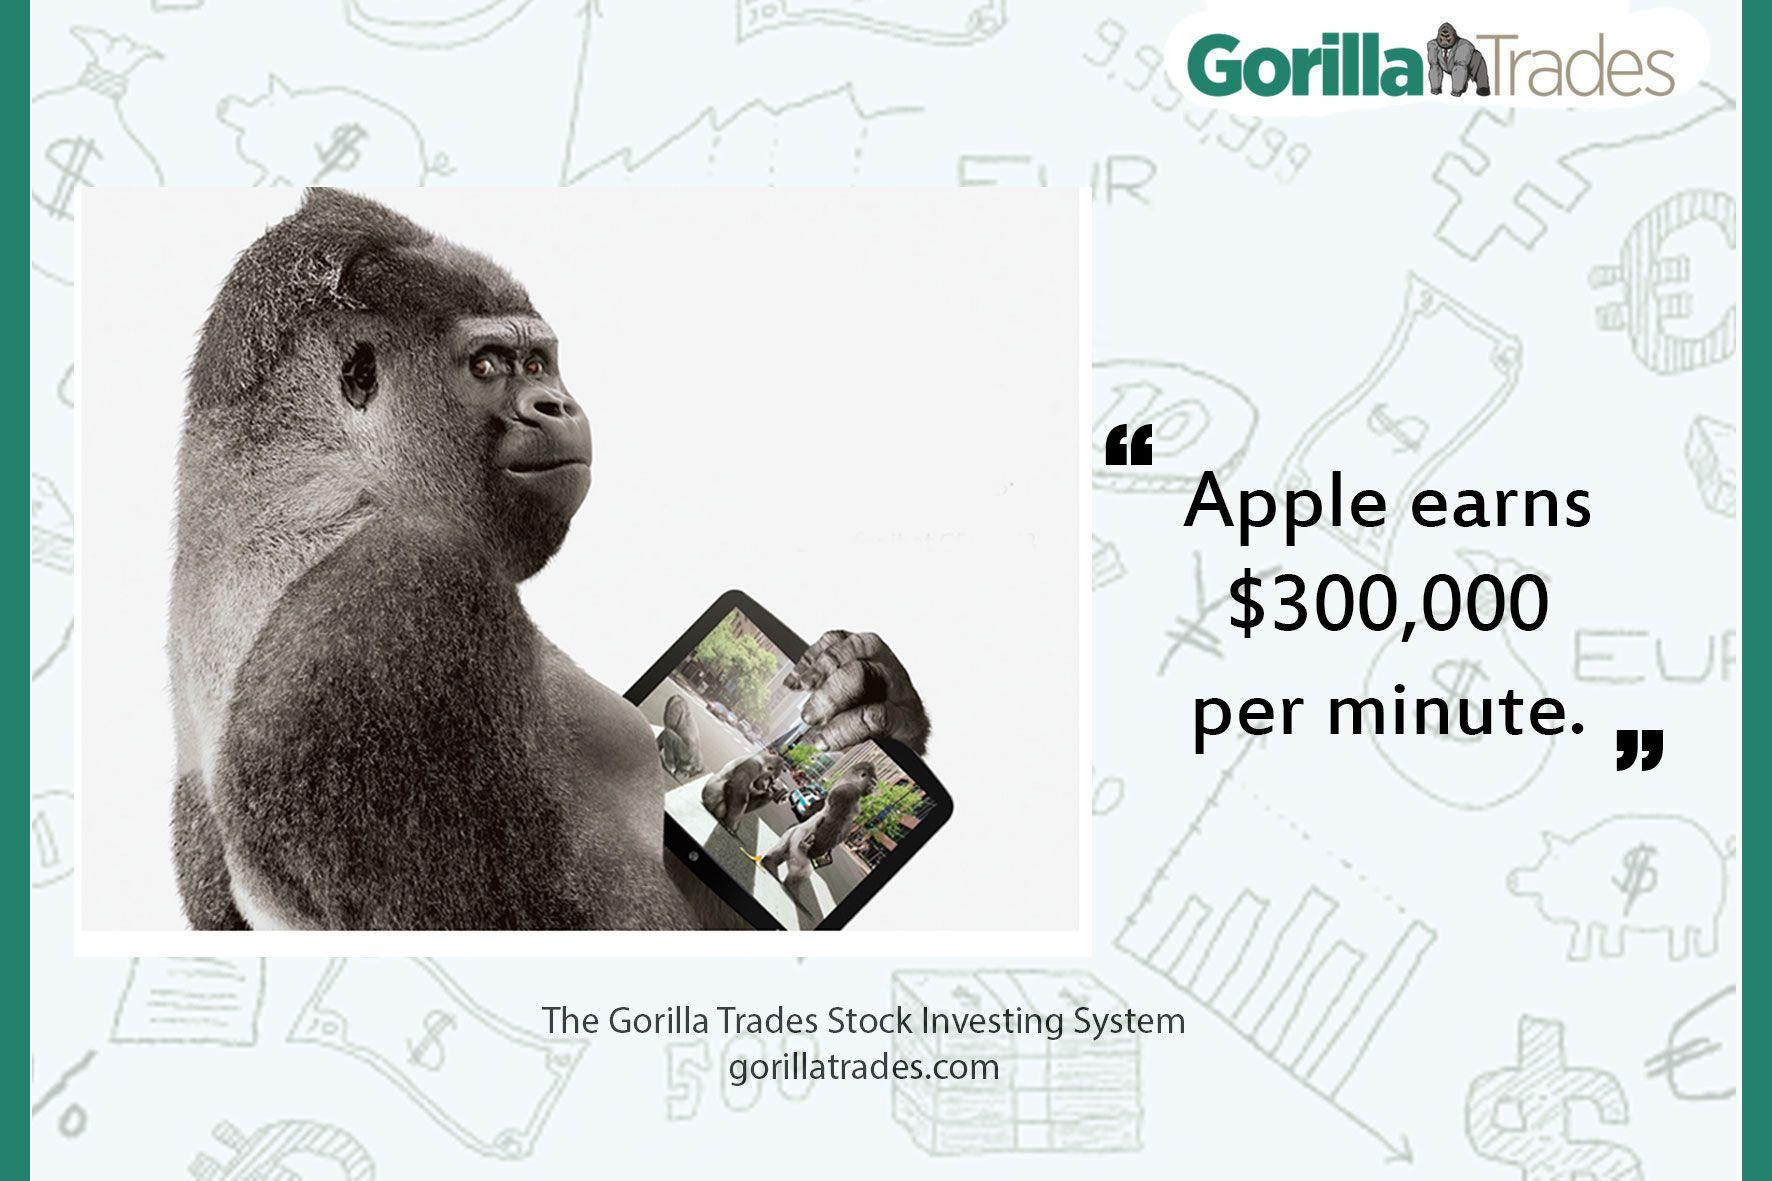 The Gorilla Trades Stock Investing System #profit, #stocktrading, #stockpicks, #gorillasatwork, #gorillatrades